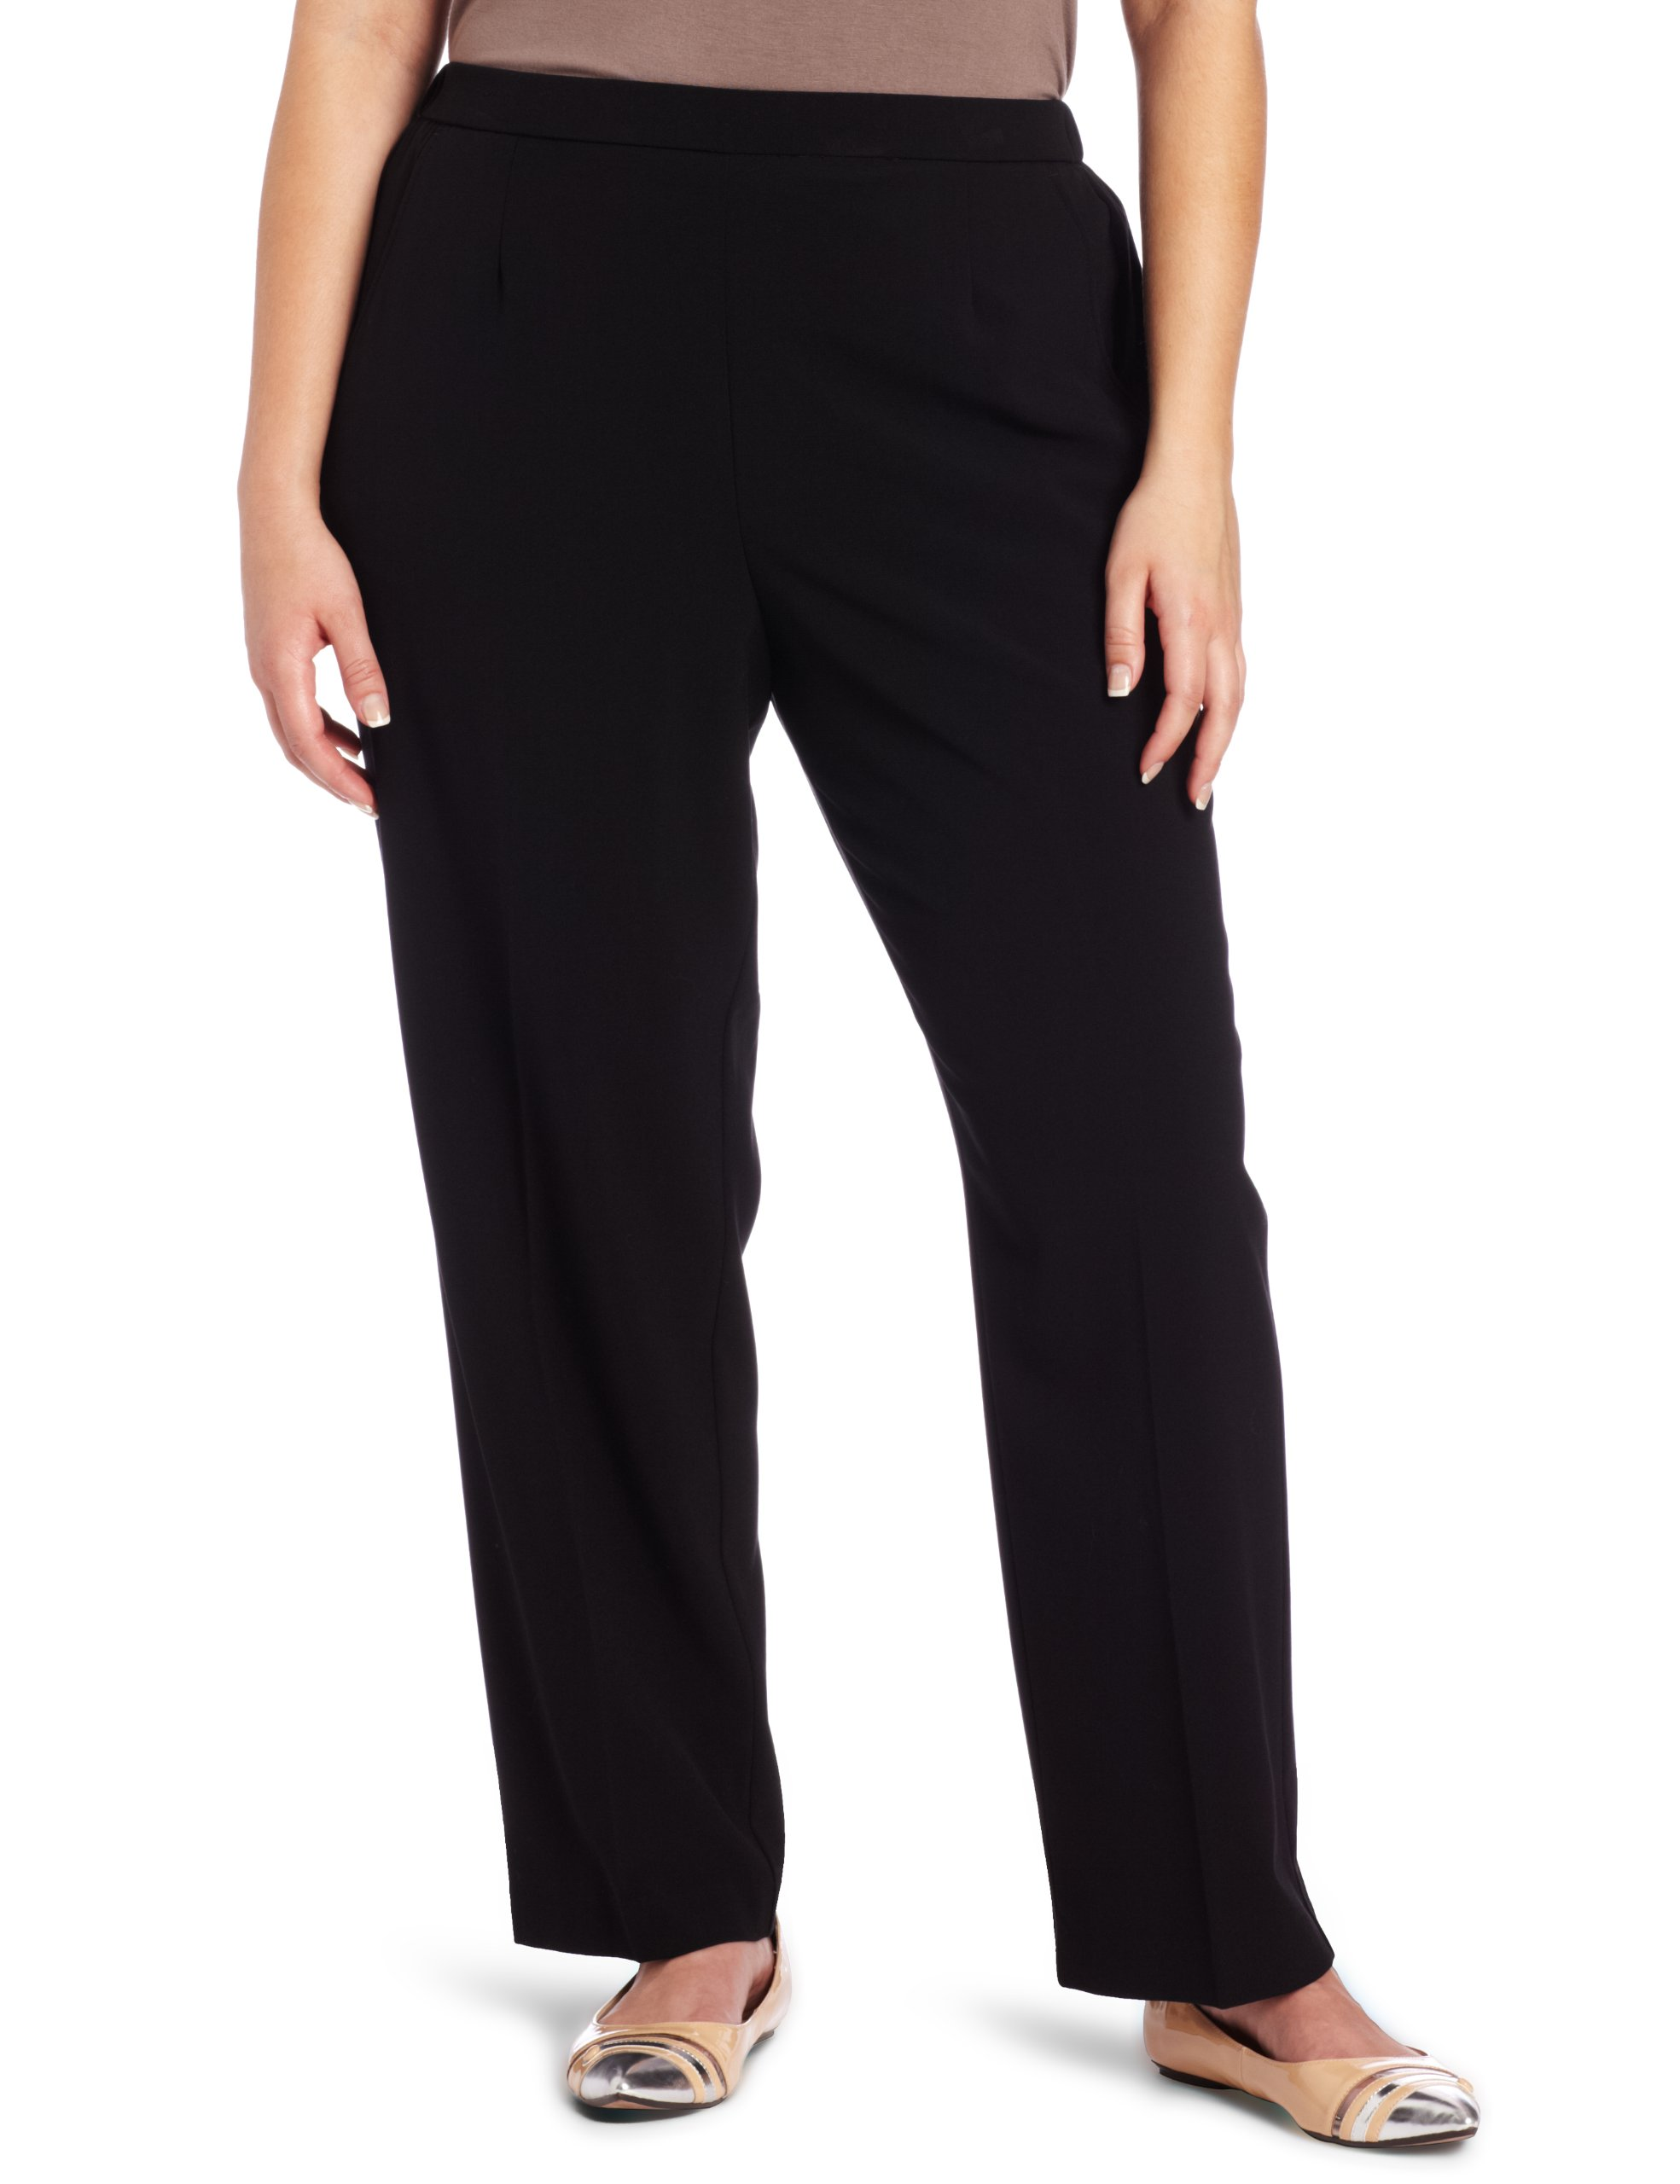 Briggs New York Women's Plus-Size Short Flat Front Pant, Black, 24